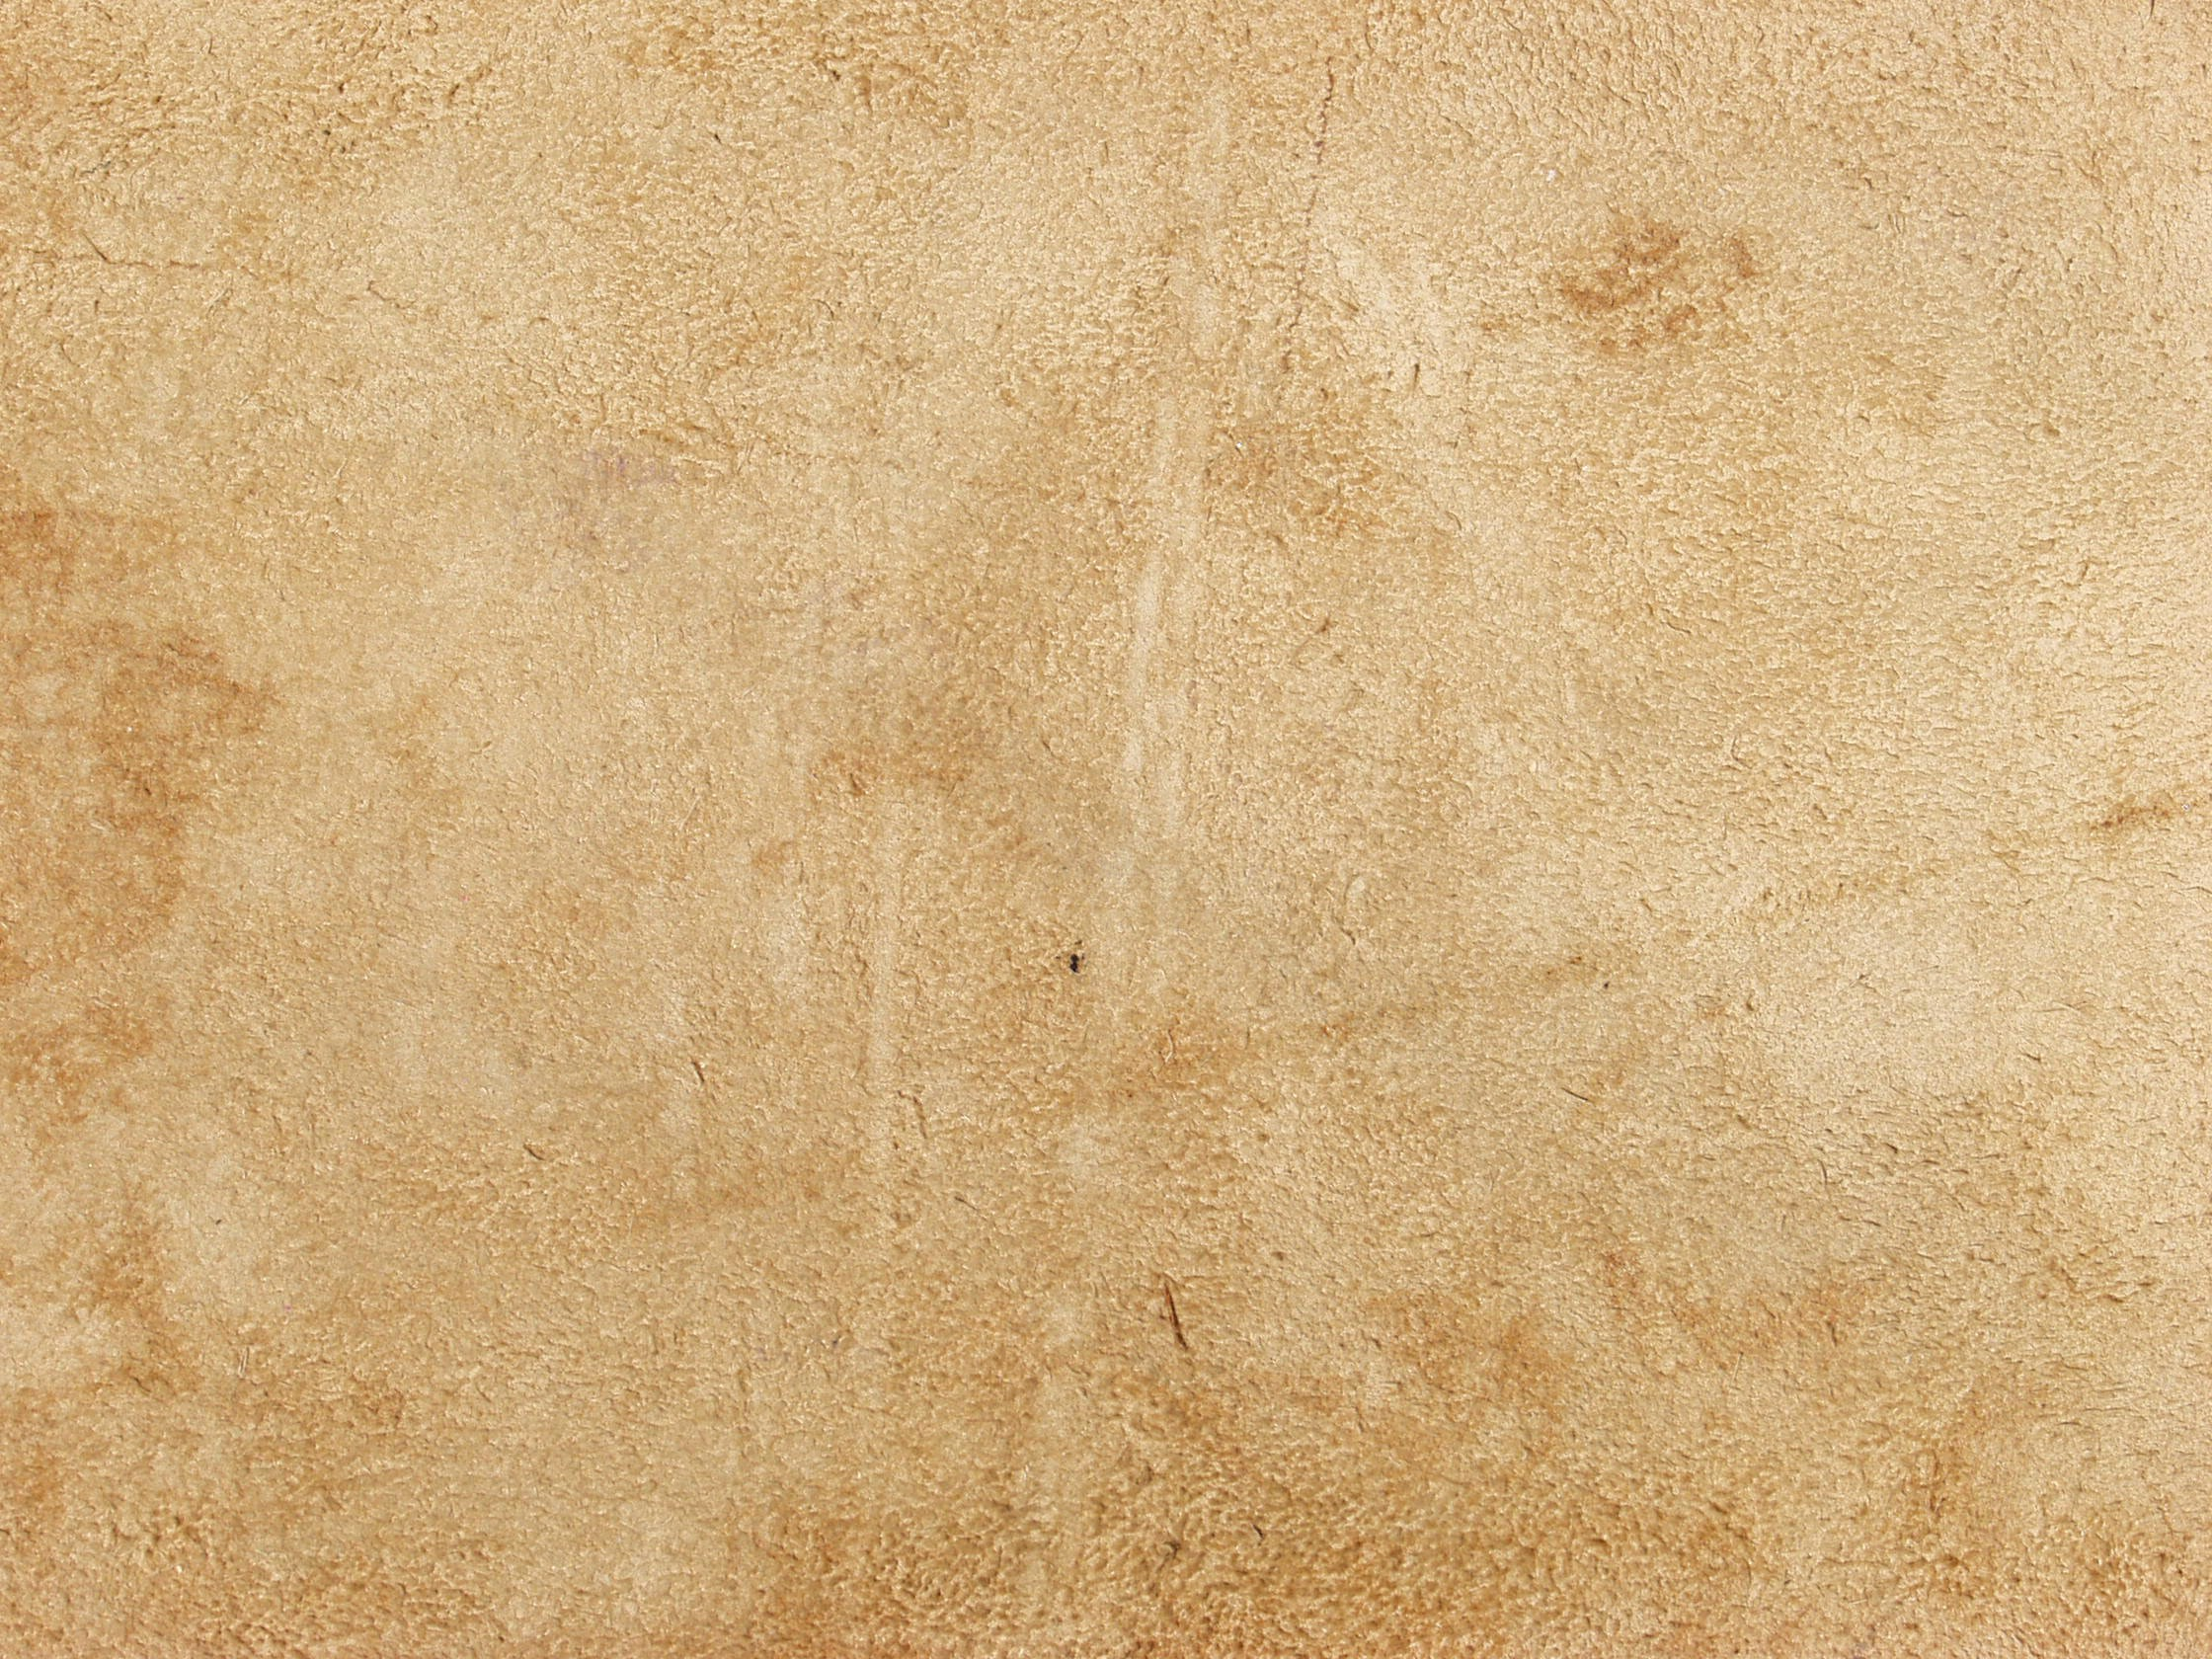 Бежевая кожа текстура 6